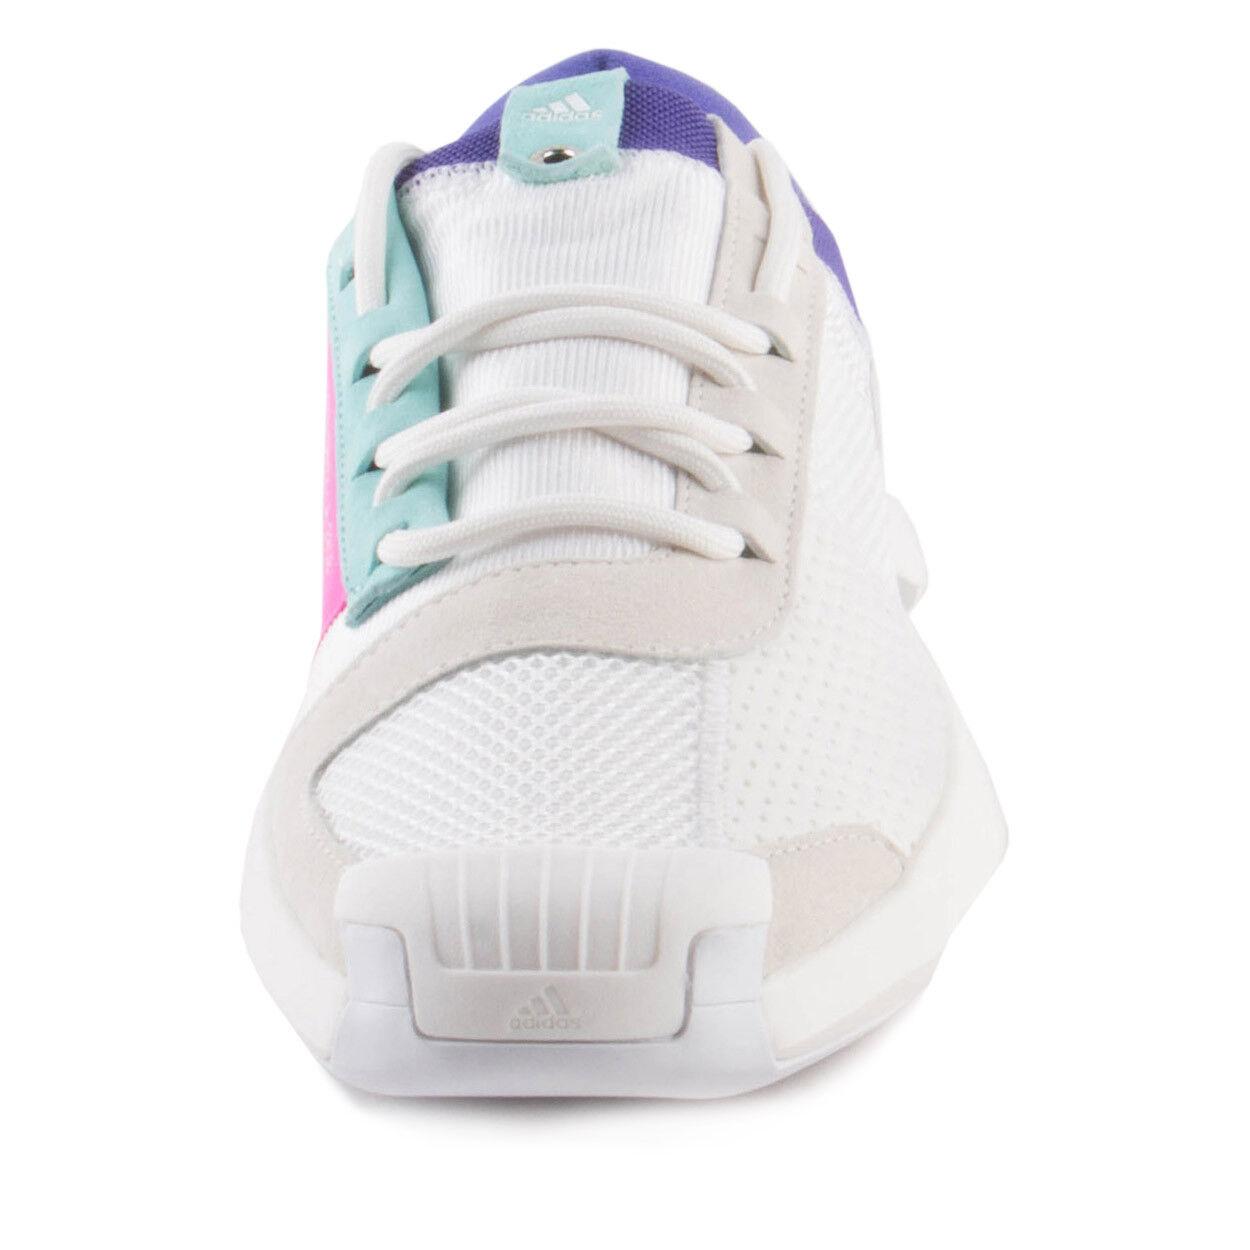 Adidas Uomo Crazy 1 ADV Nicekicks White/Off white-Aqua DB1786